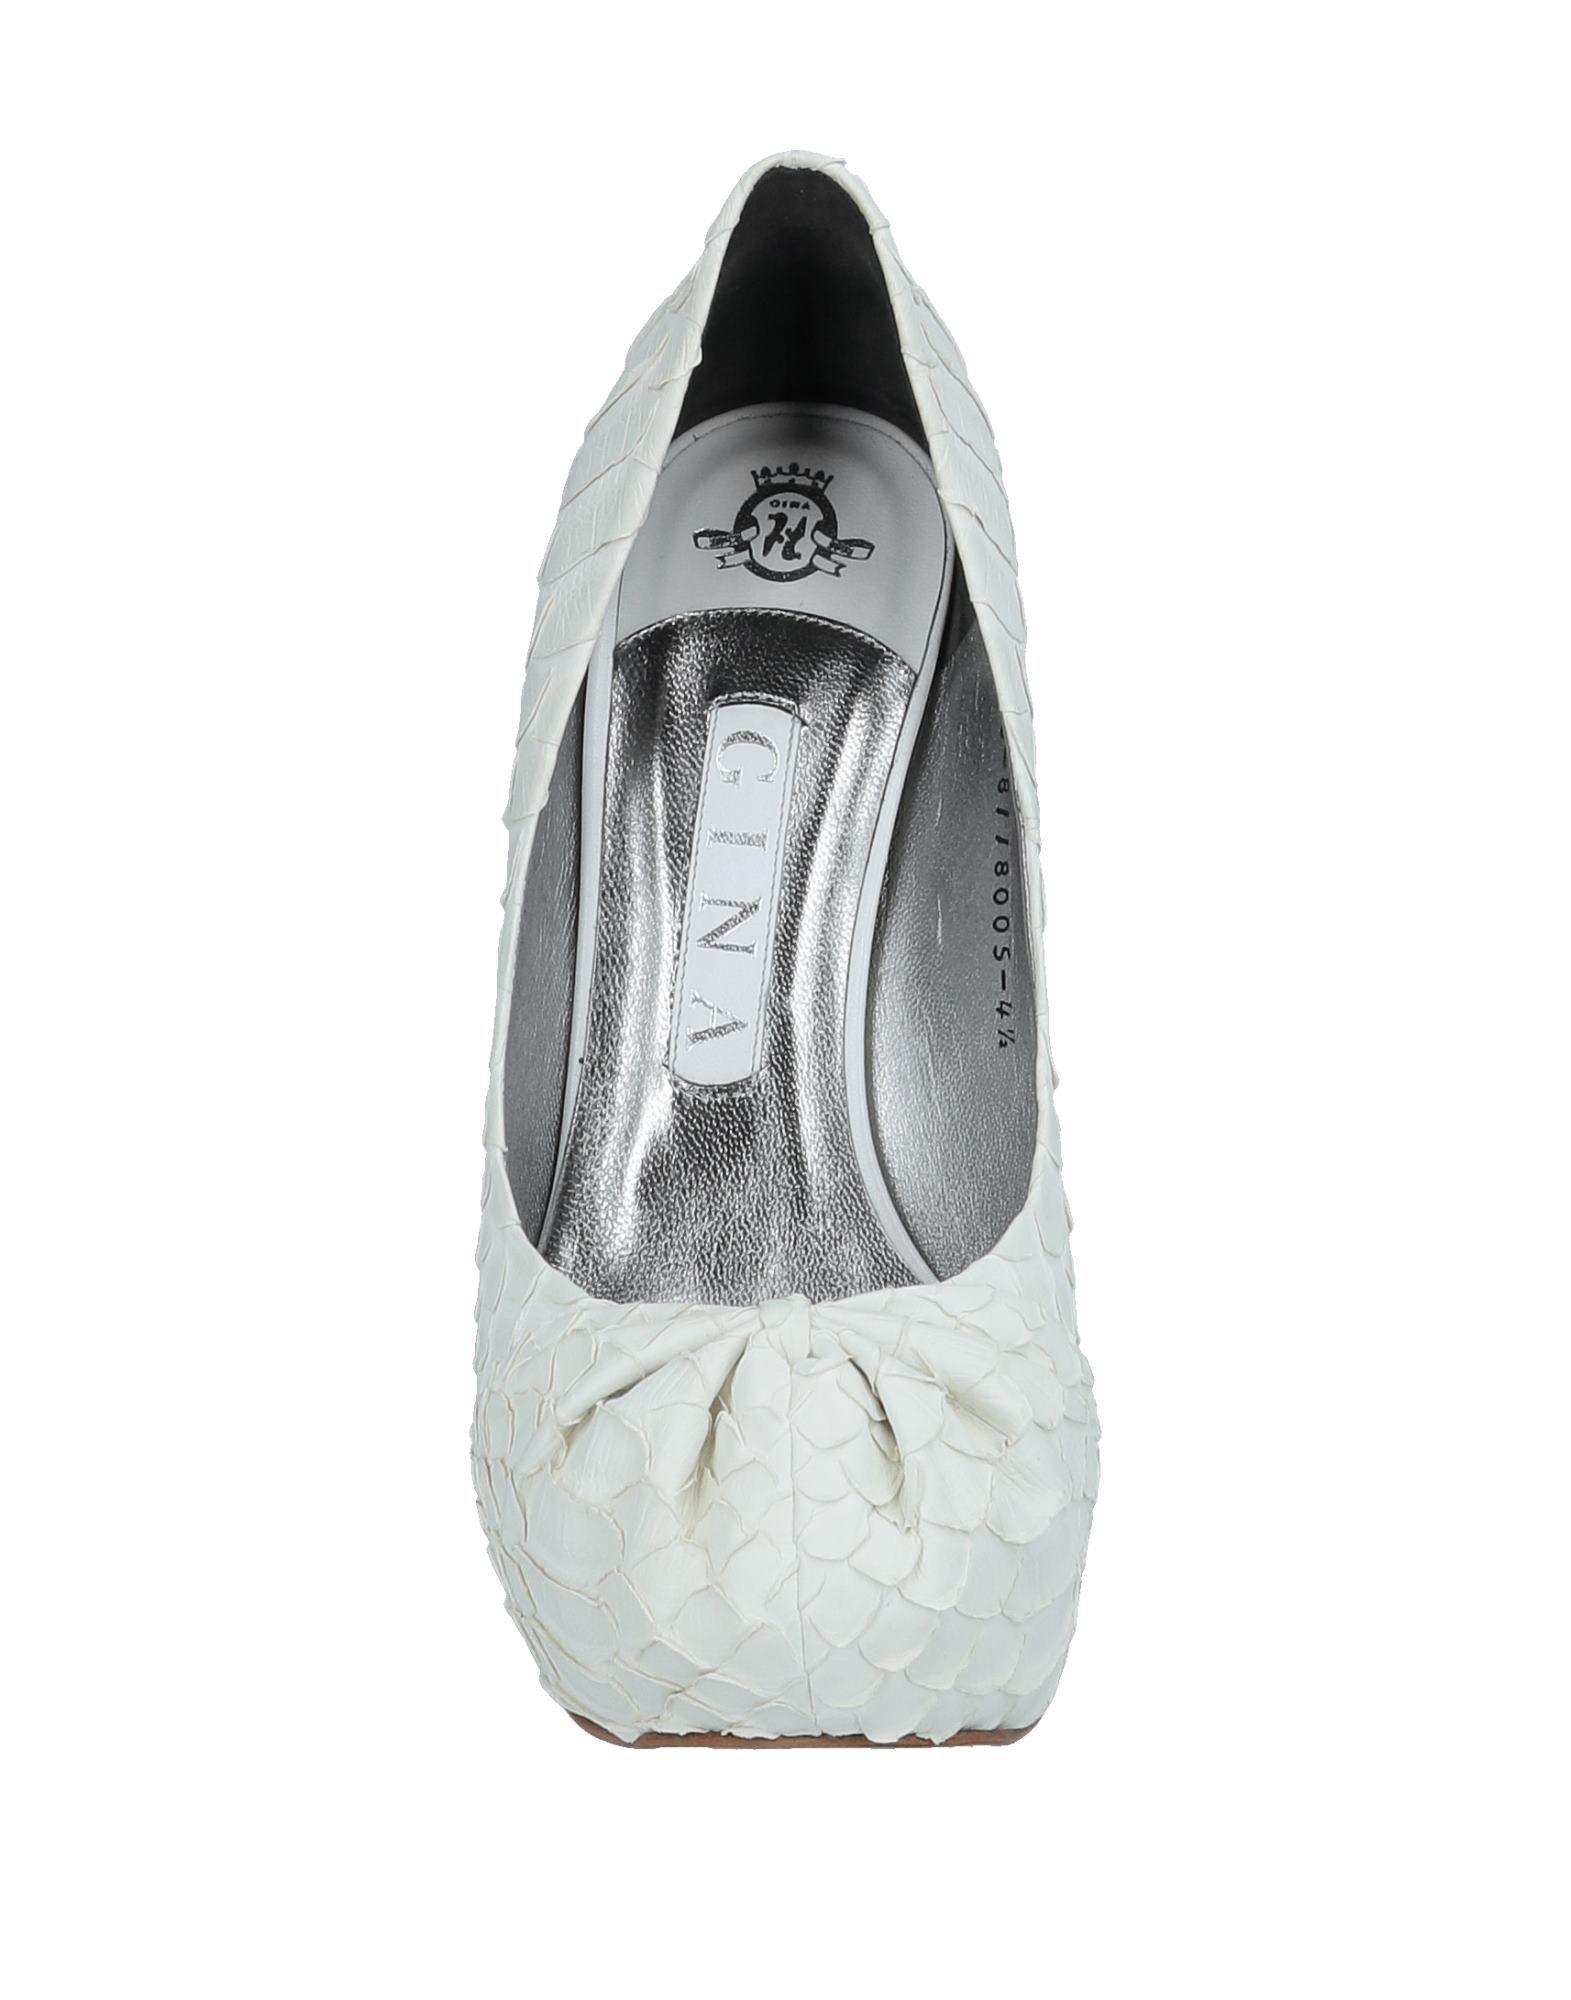 Stilvolle billige Schuhe 11556339XX Gina Pumps Damen  11556339XX Schuhe 4147f9